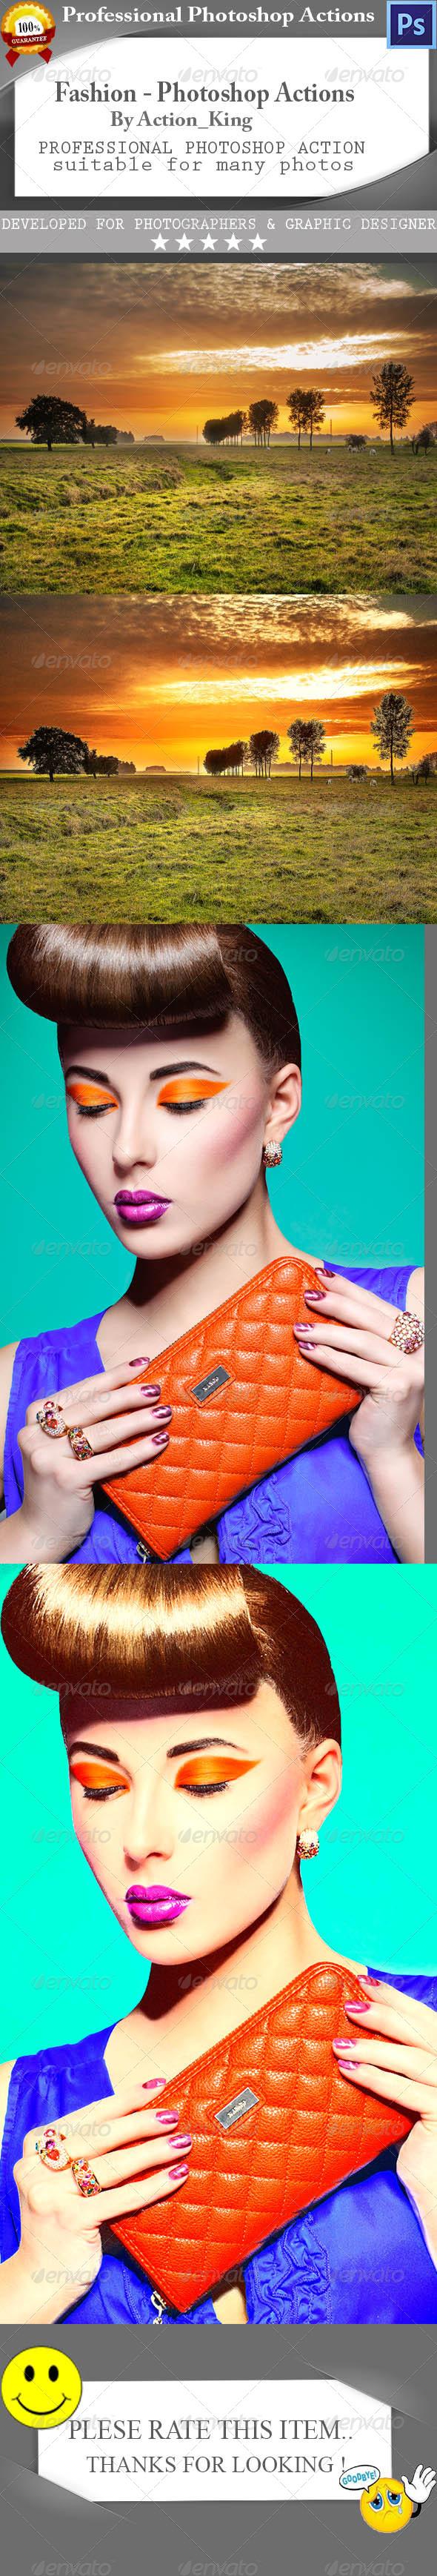 GraphicRiver Fashion Photoshop Actions 8187750